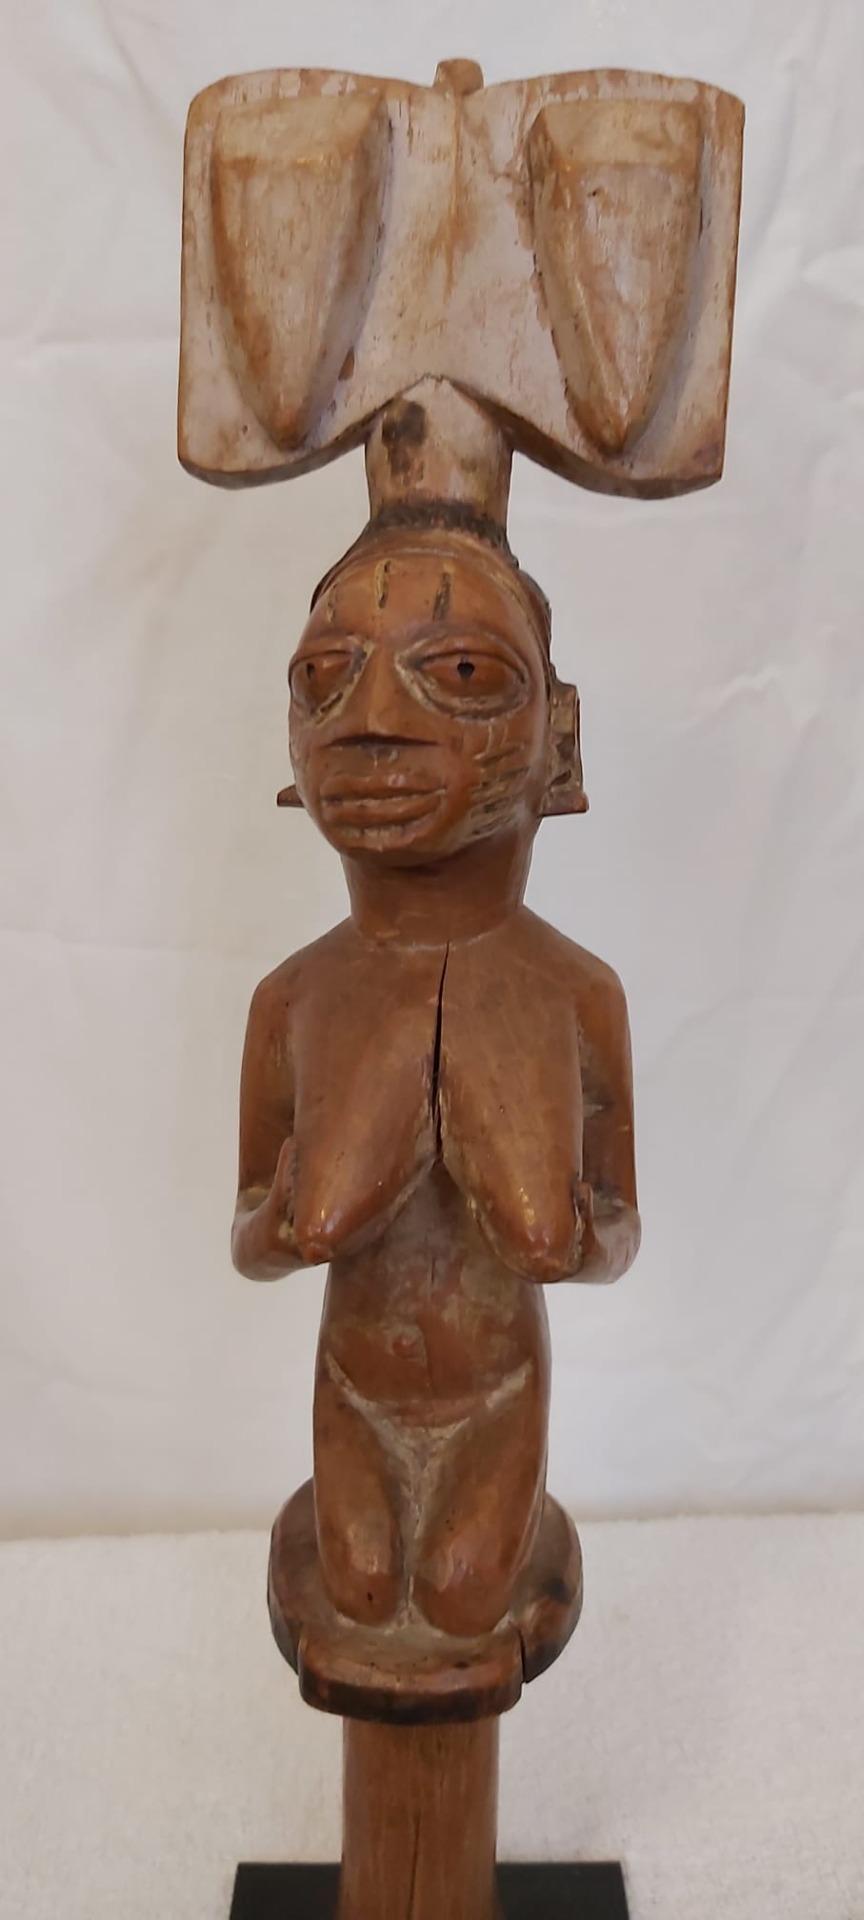 thumb3|Scettro Yoruba (Nigeria)  epoca 1940/50